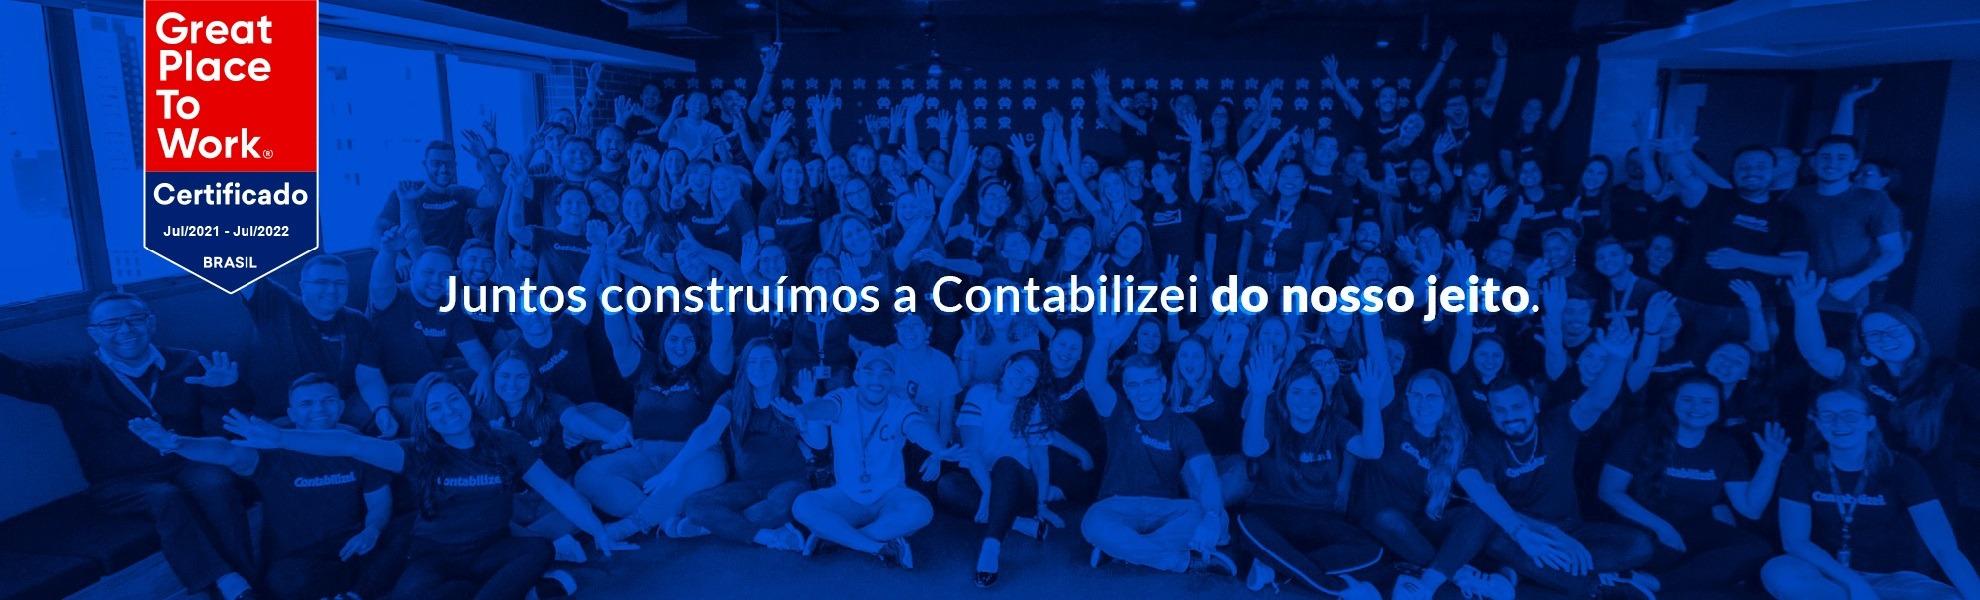 Inside Sales - Upsell - São Paulo e Curitiba